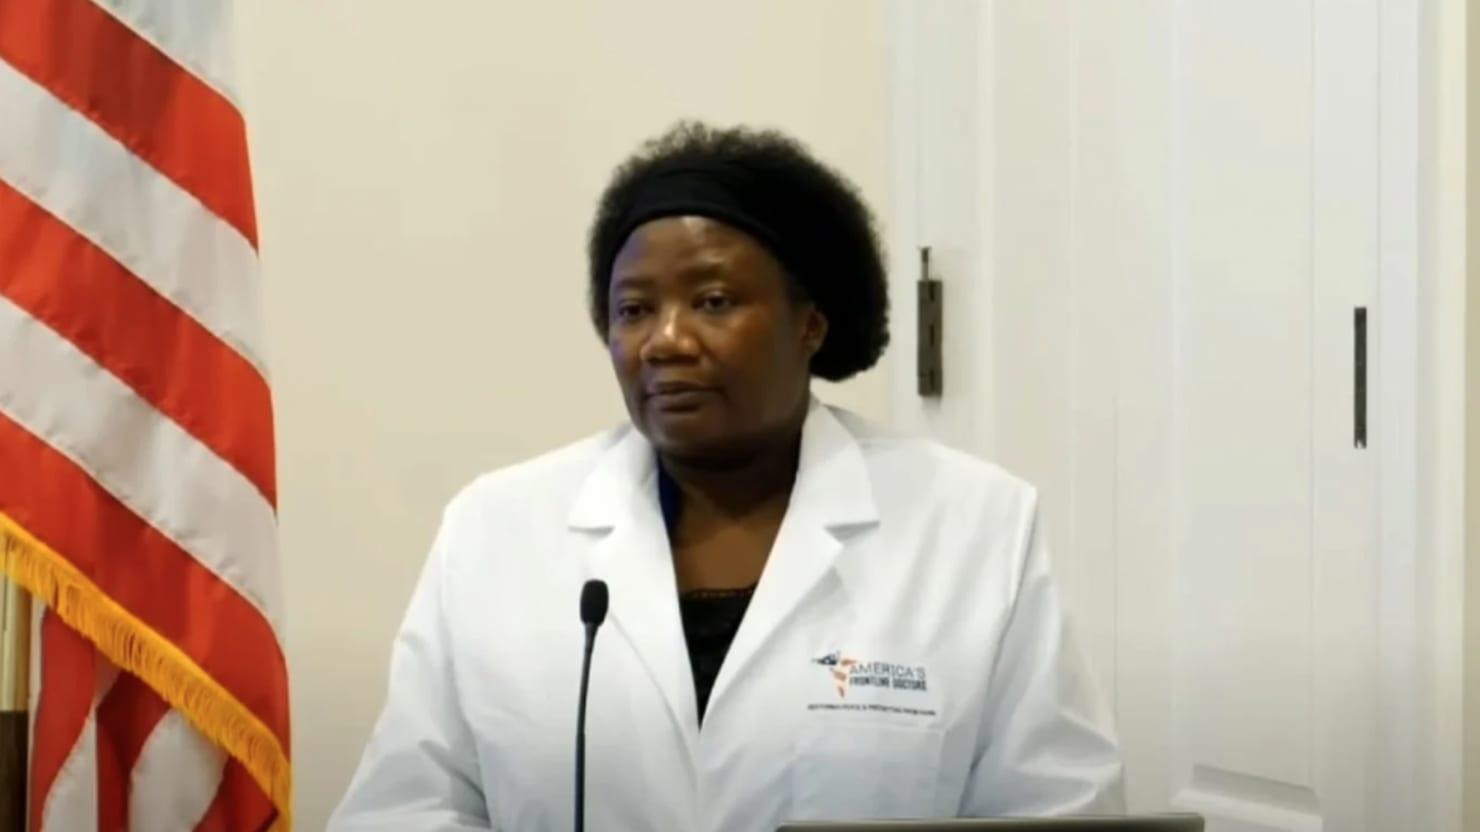 Trump Coronavirus Doctor: I Believe in 'Demonic Spirits That Sleep With Women' Not 'Demon Sperm'